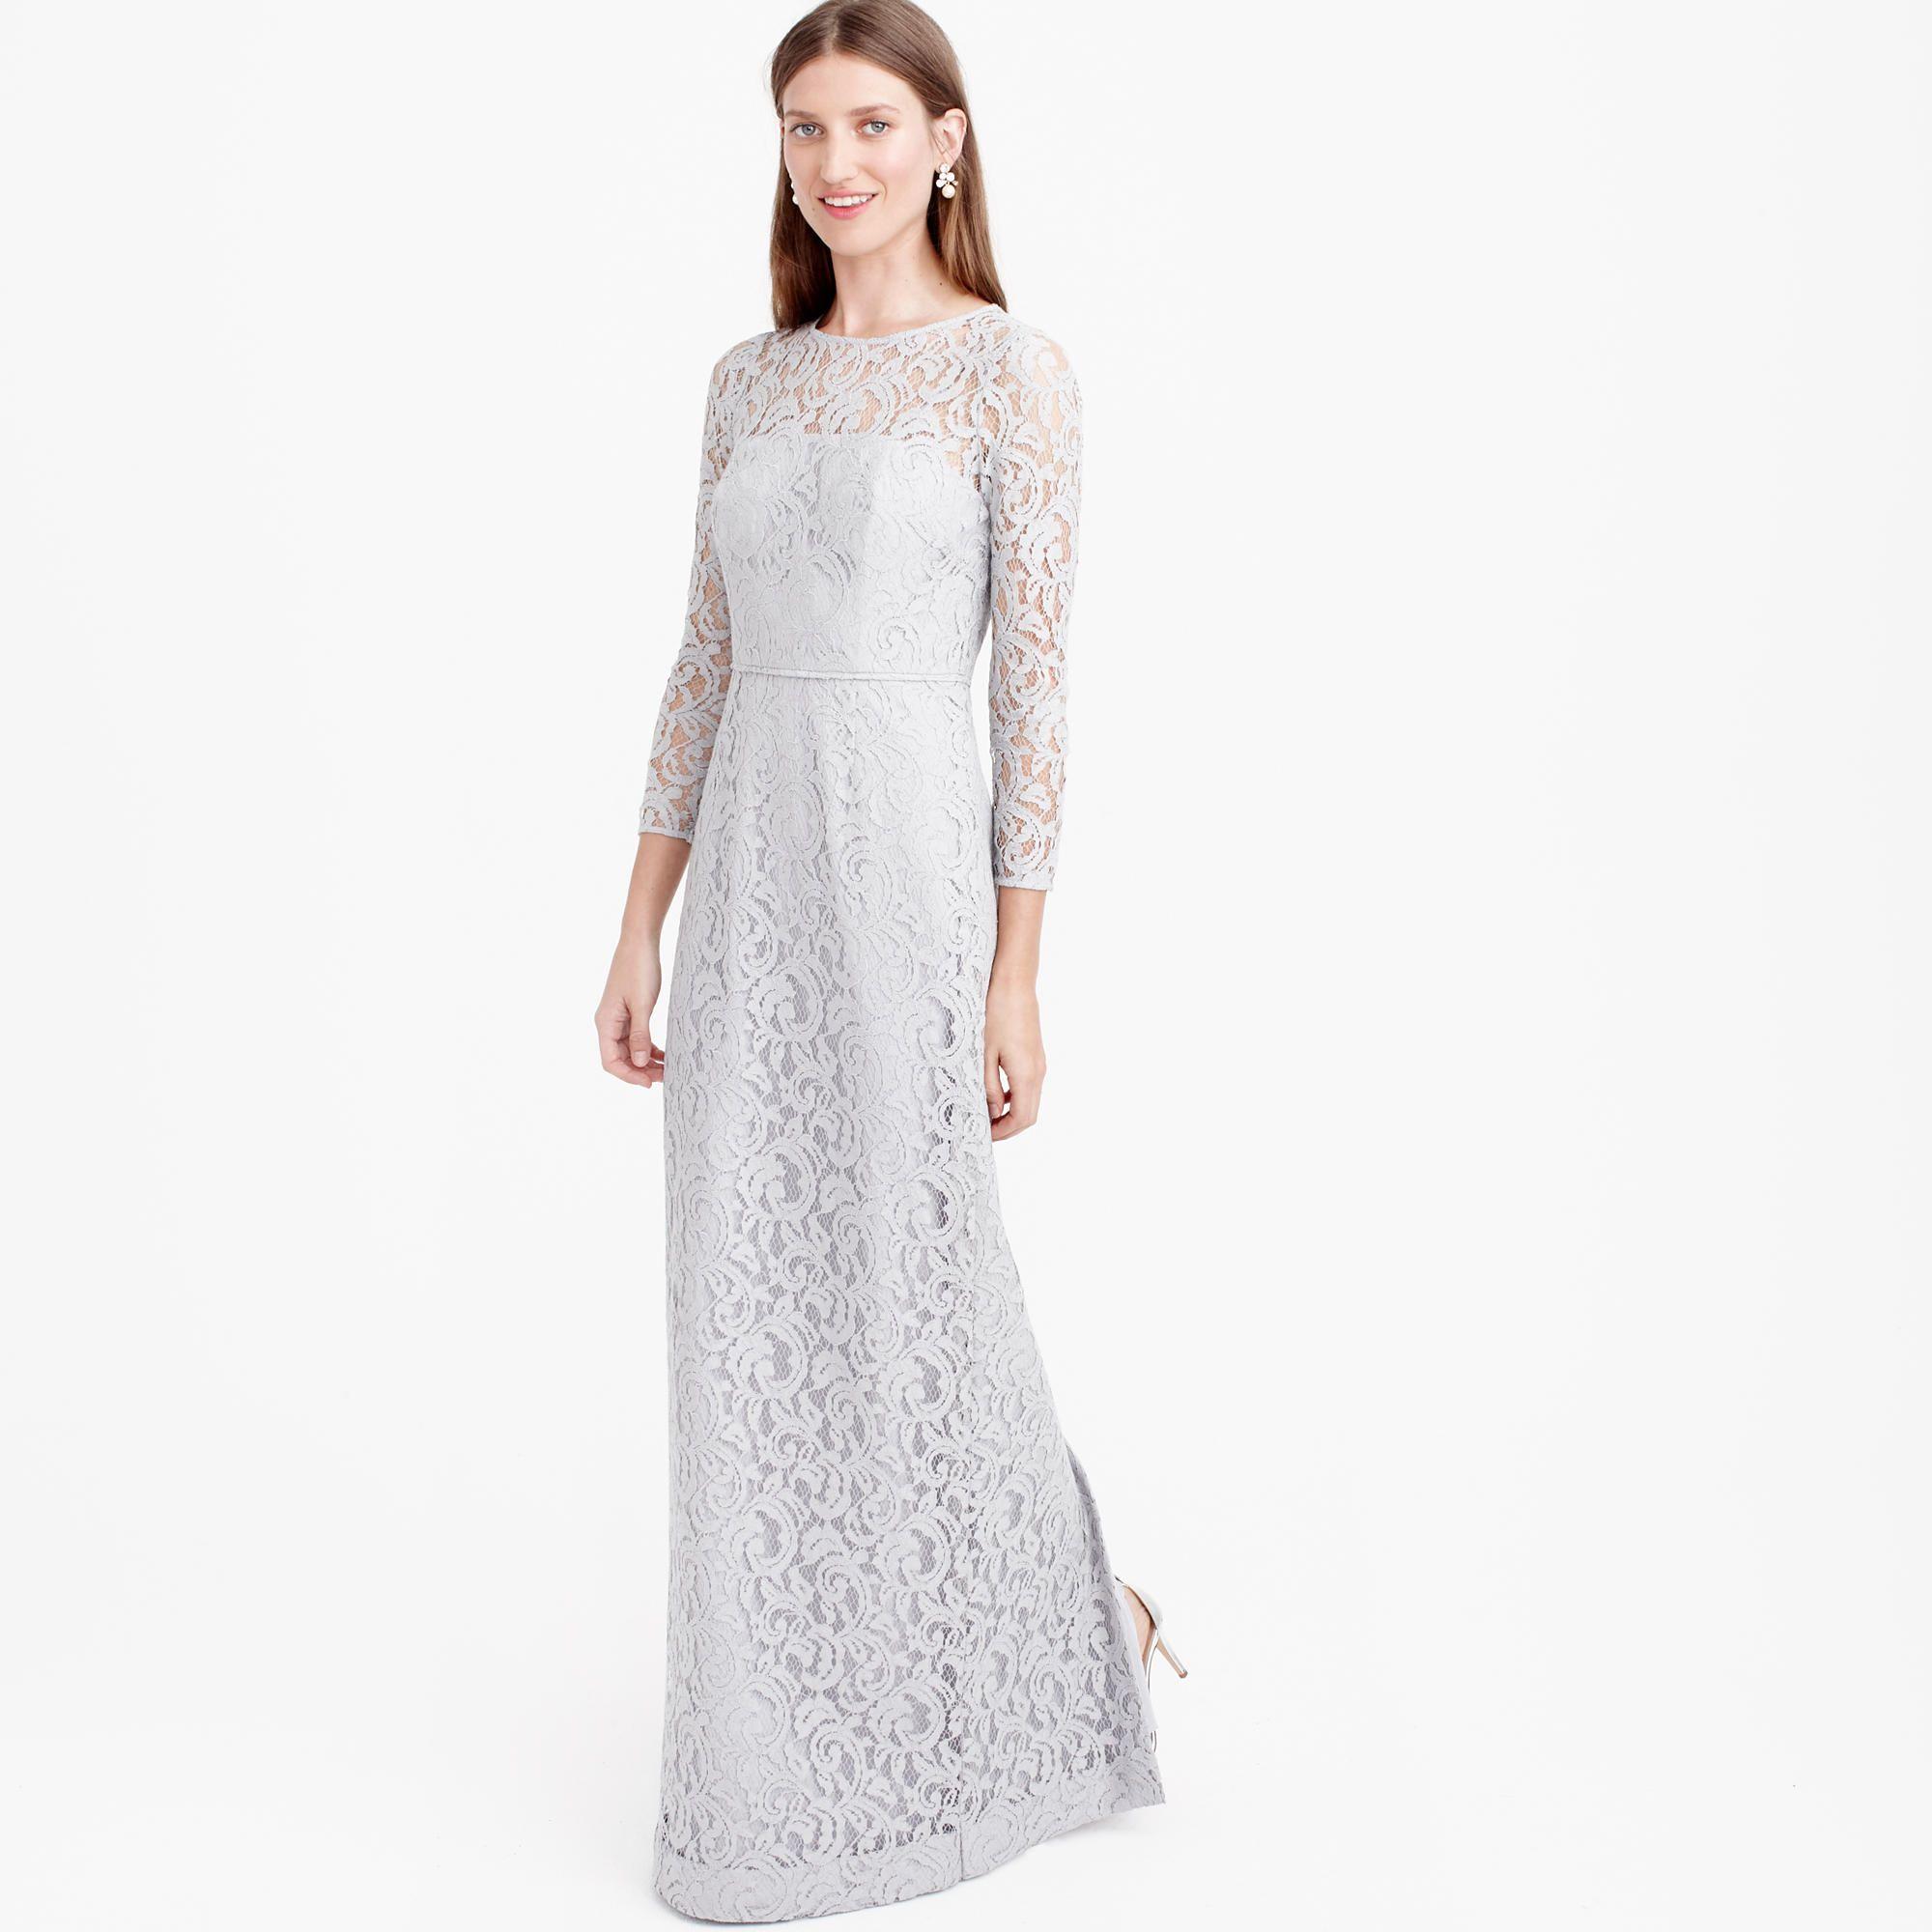 298 jcrew maxi lace grey dream wedding pinterest 298 jcrew maxi lace grey ombrellifo Gallery